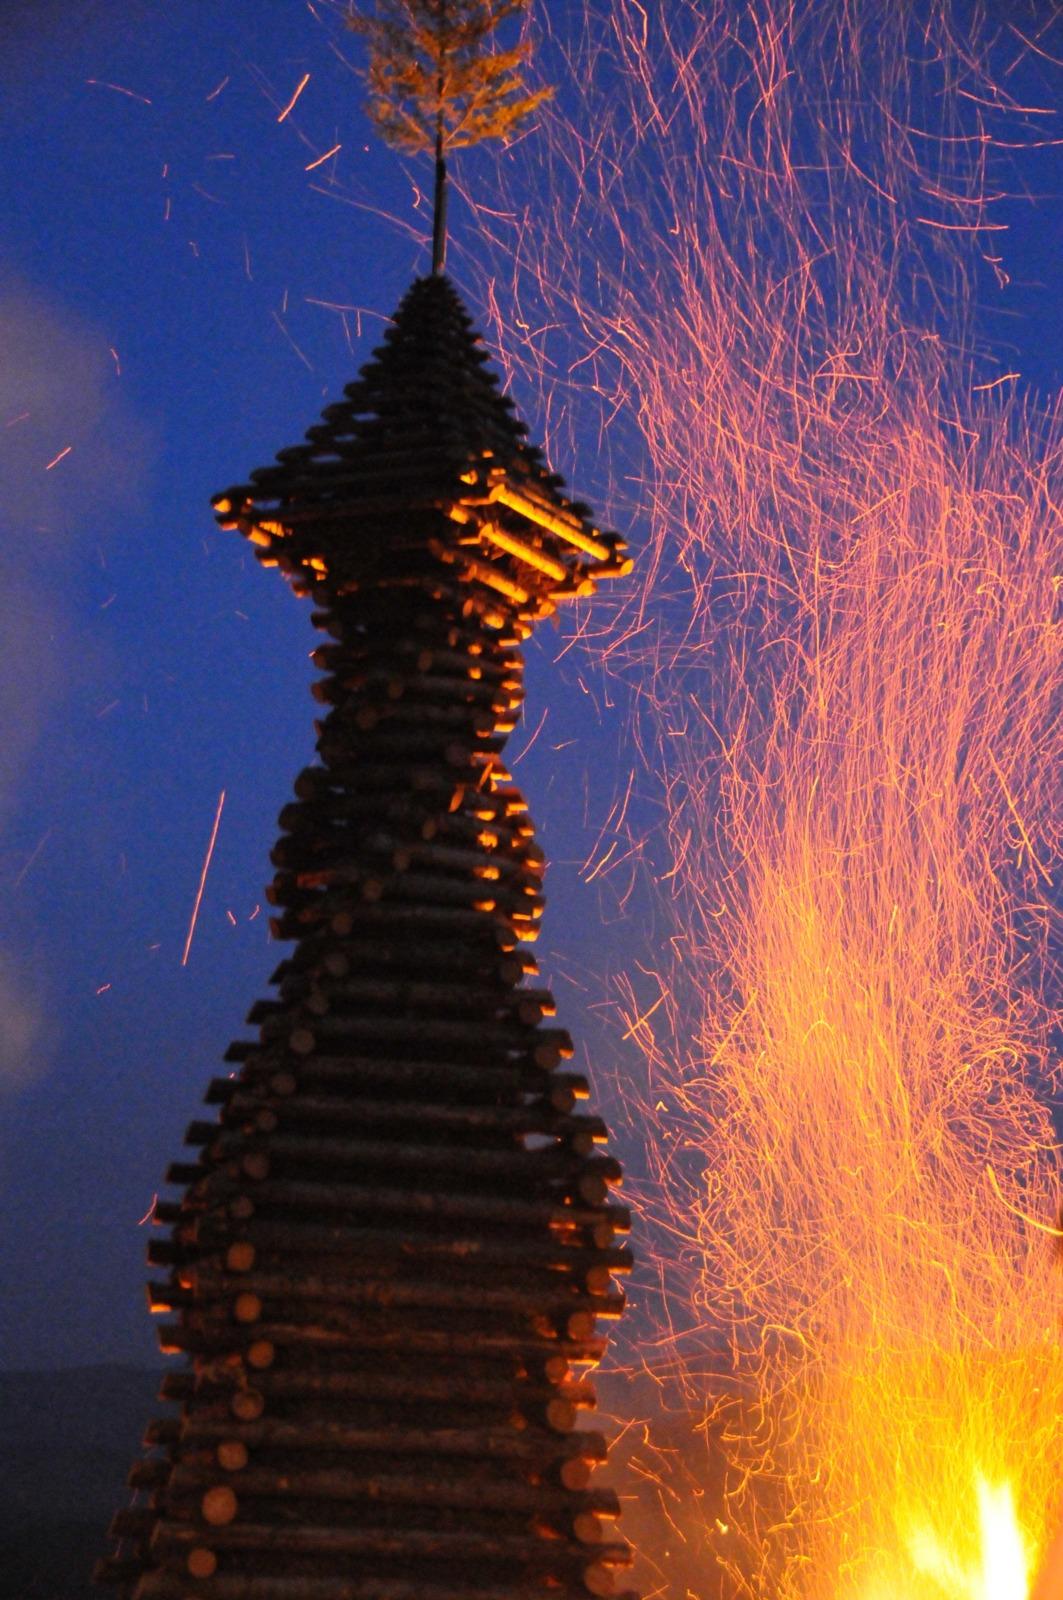 Feast of Saint John in France - Midsummer fire in the Saint-Amarin valley © Daniel Nussbaum